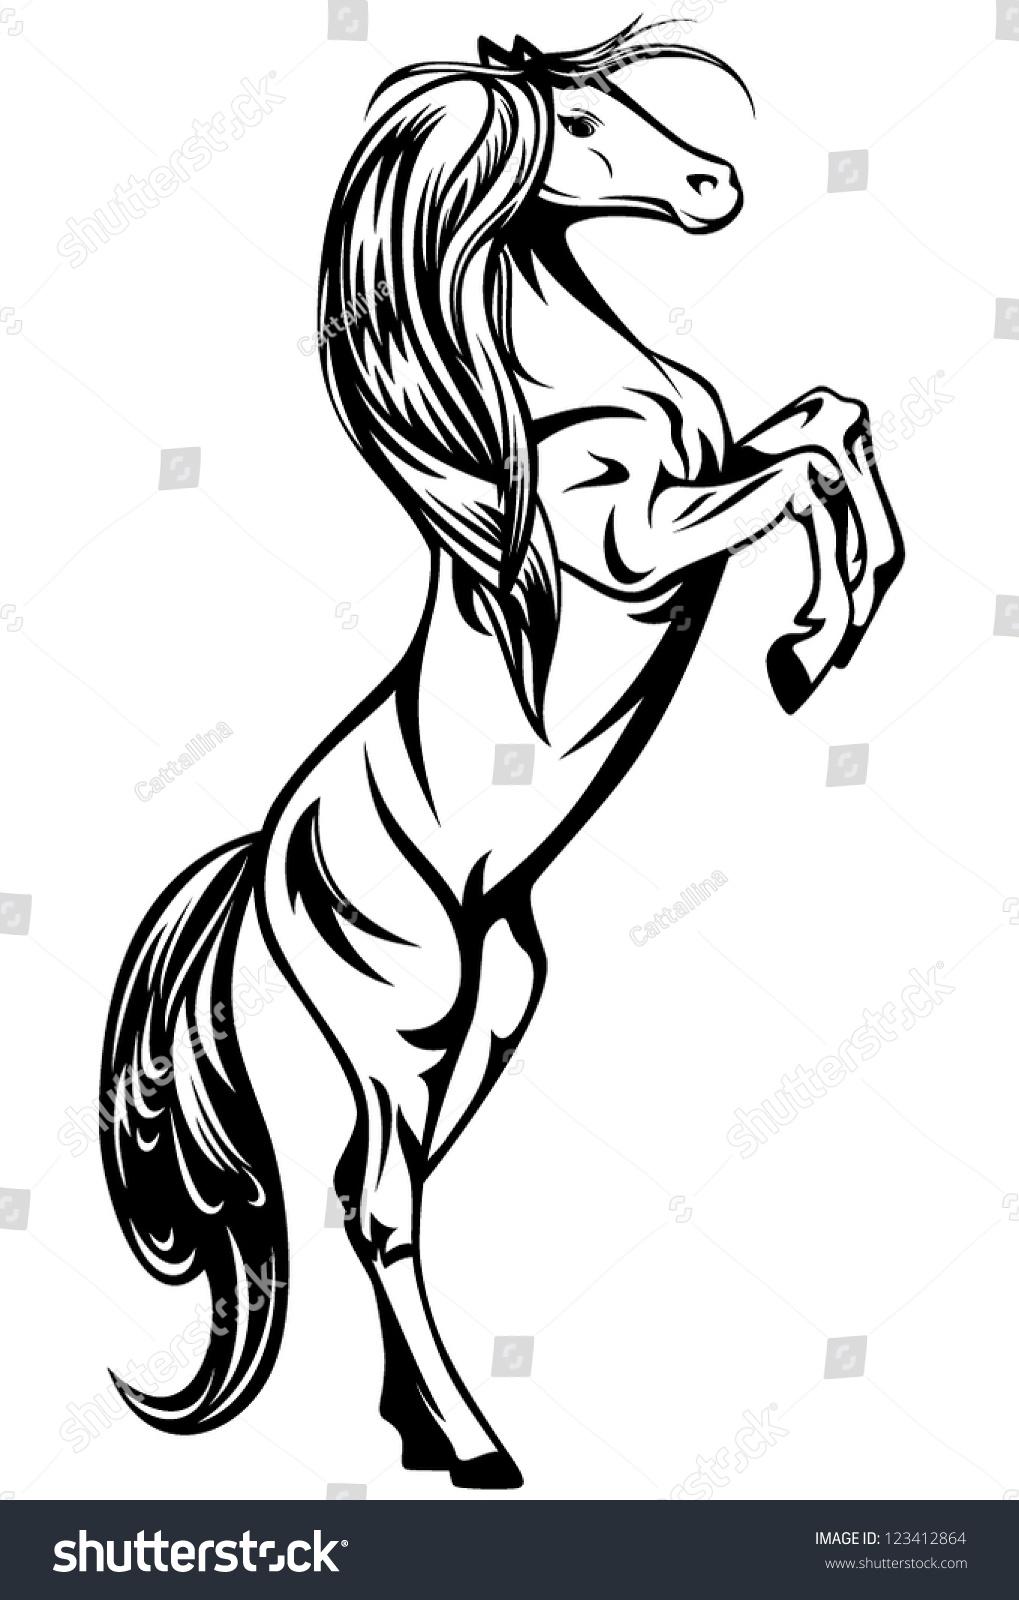 horse lovers clip art - photo #33